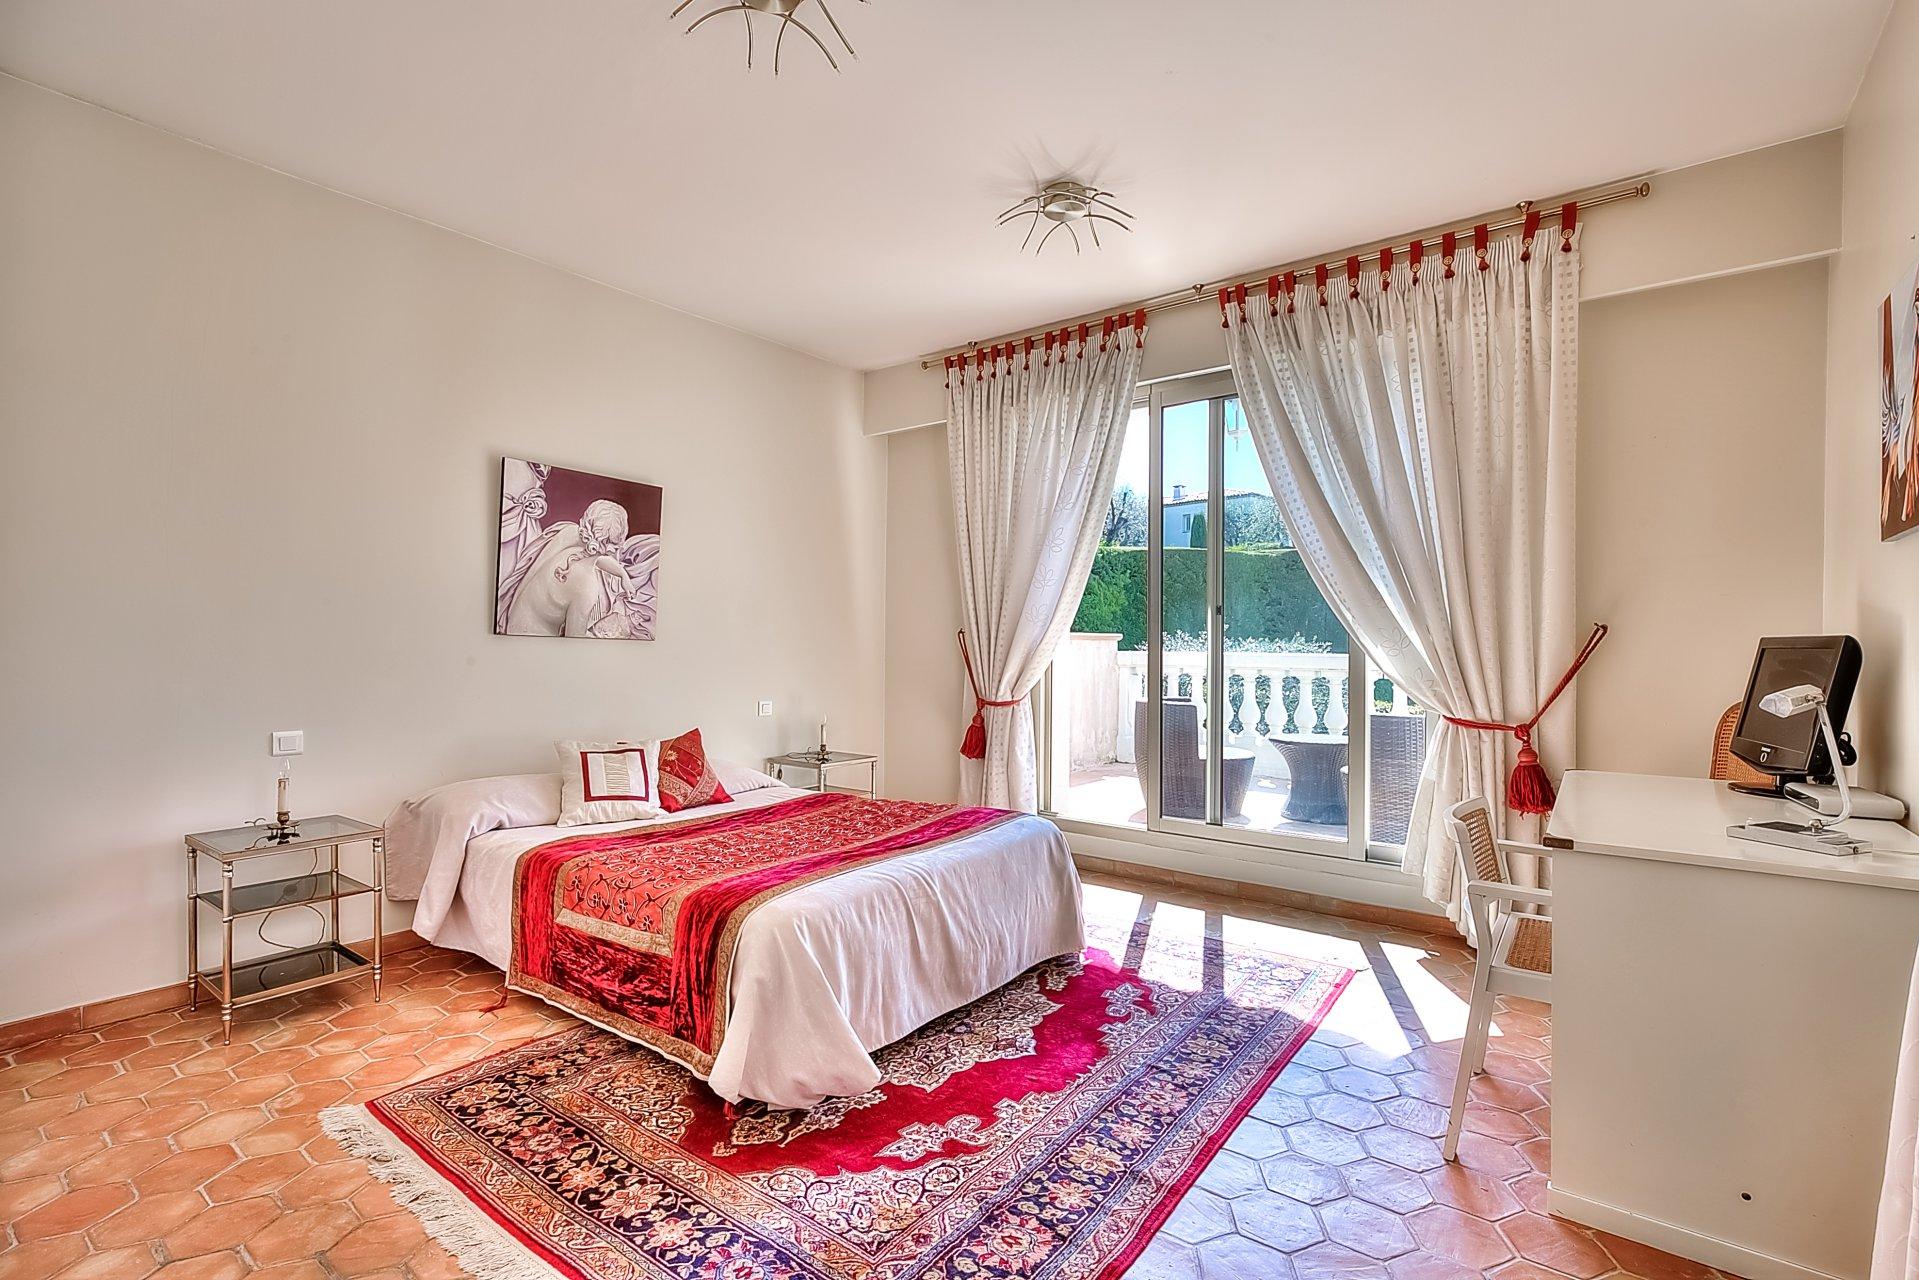 A vendre, Villa 8 pièces - 5 chambres - 267 m²,  Nice Gairaut